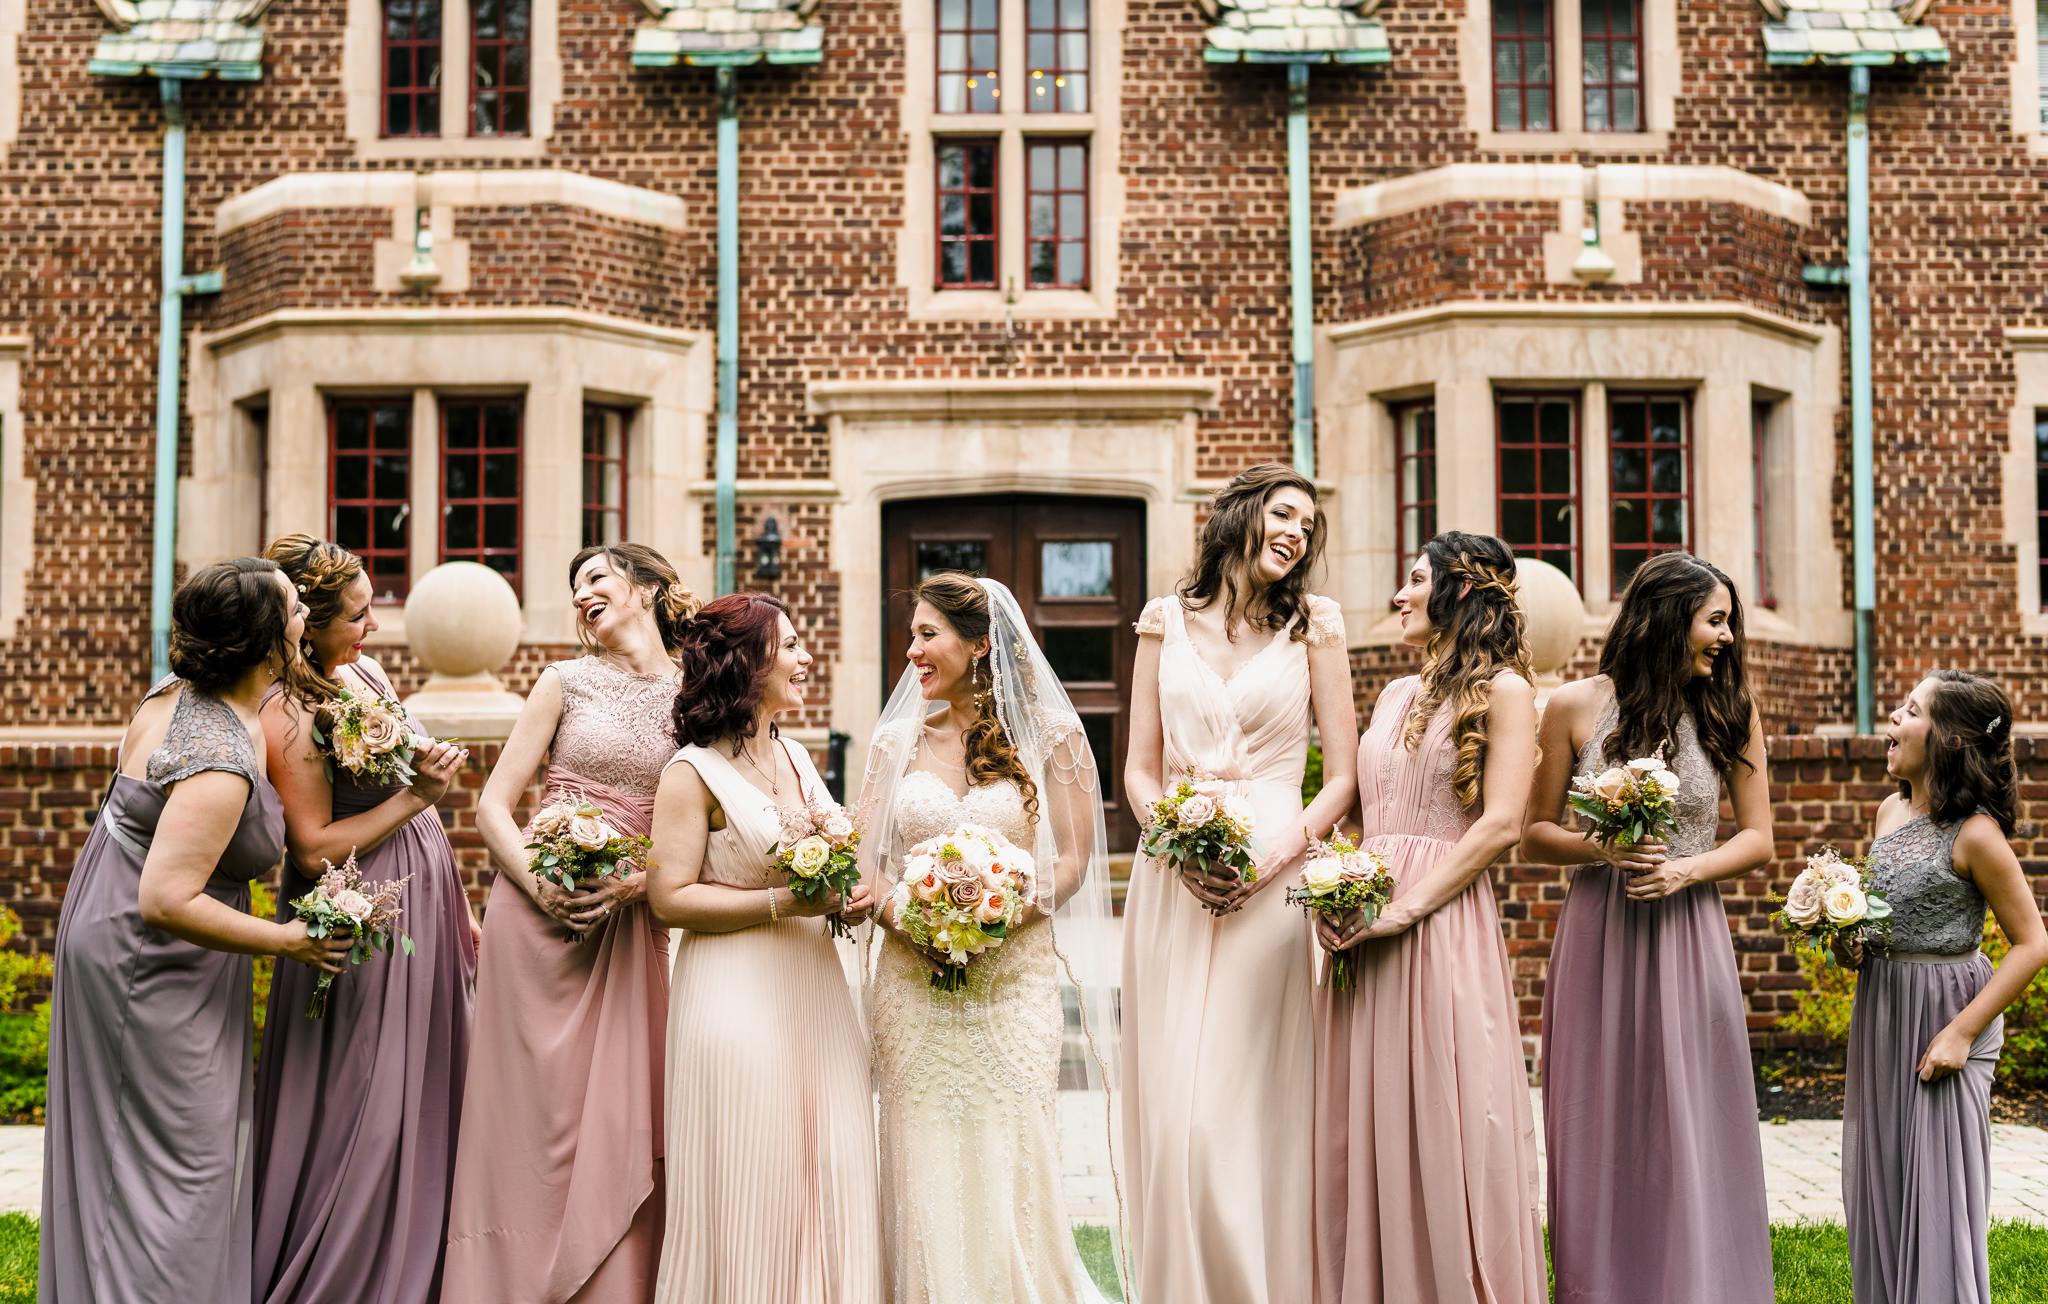 Barbato-Moorestown-Community-House-Wedding-New-Jersey-Photographer-14.JPG